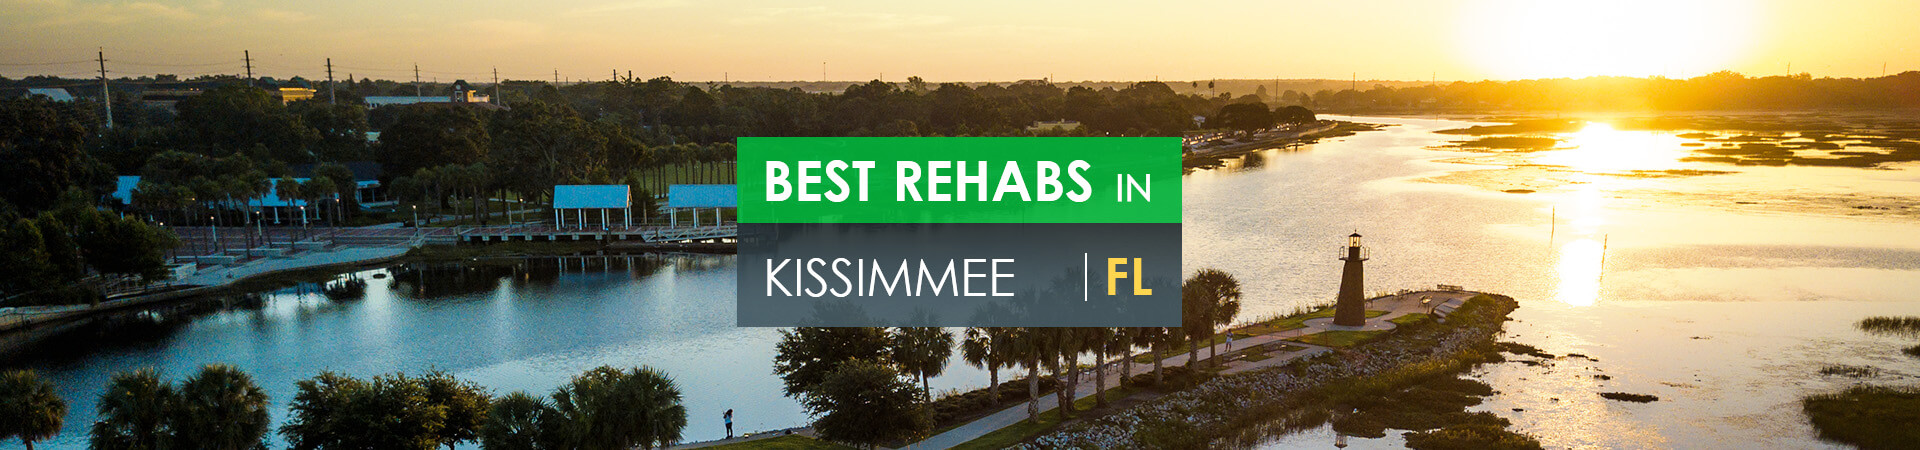 Best rehabs in Kissimmee, FL